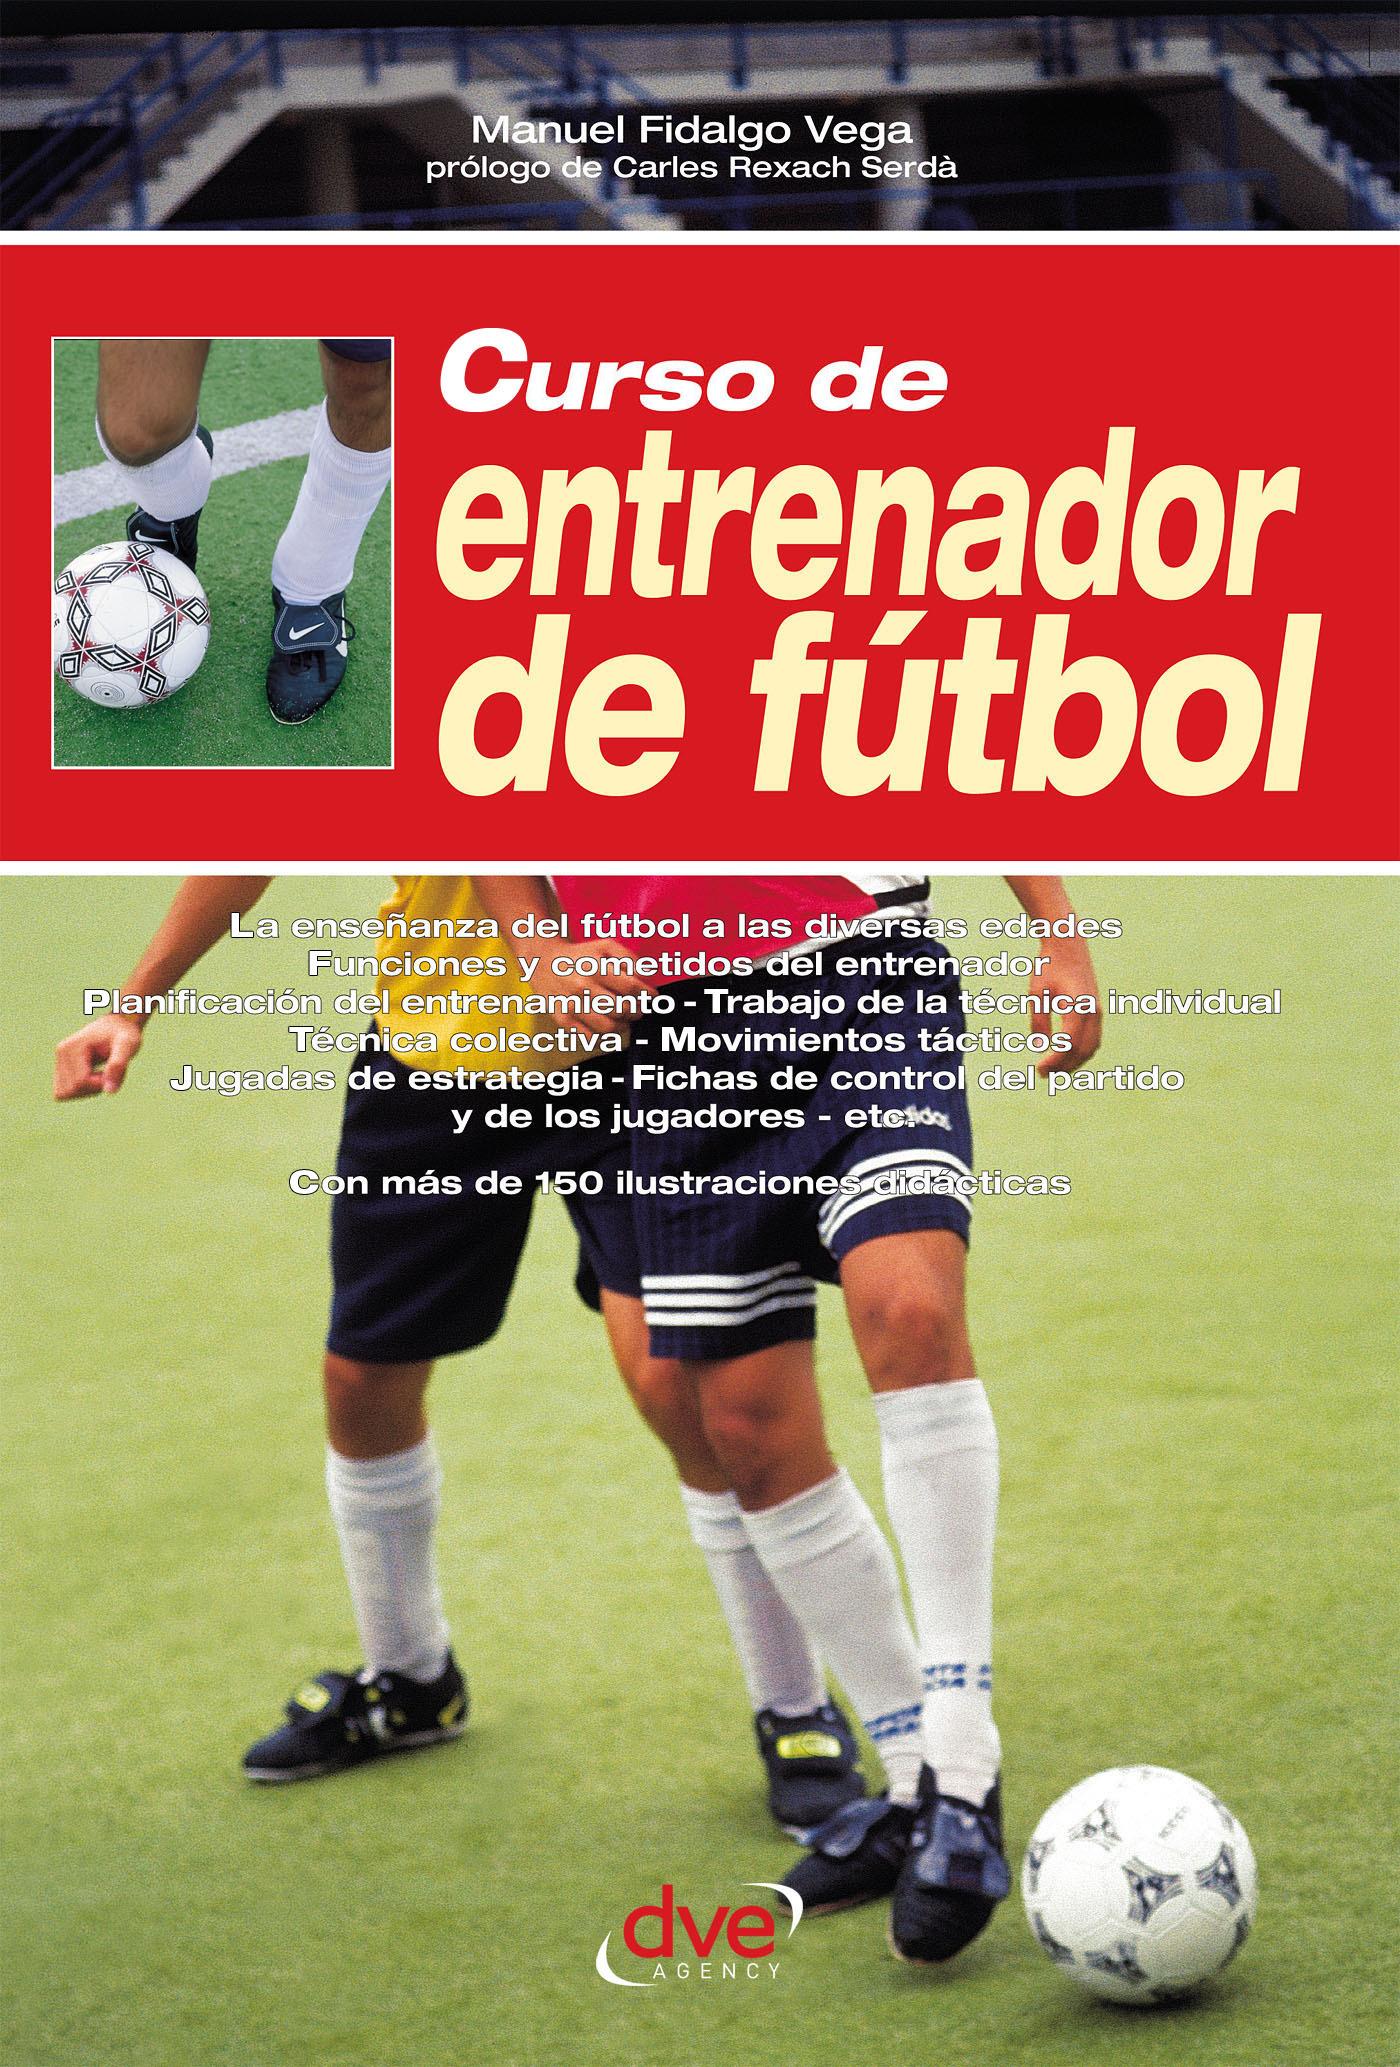 Vega, Manuel Fidalgo - Curso de entrenador de fútbol, ebook